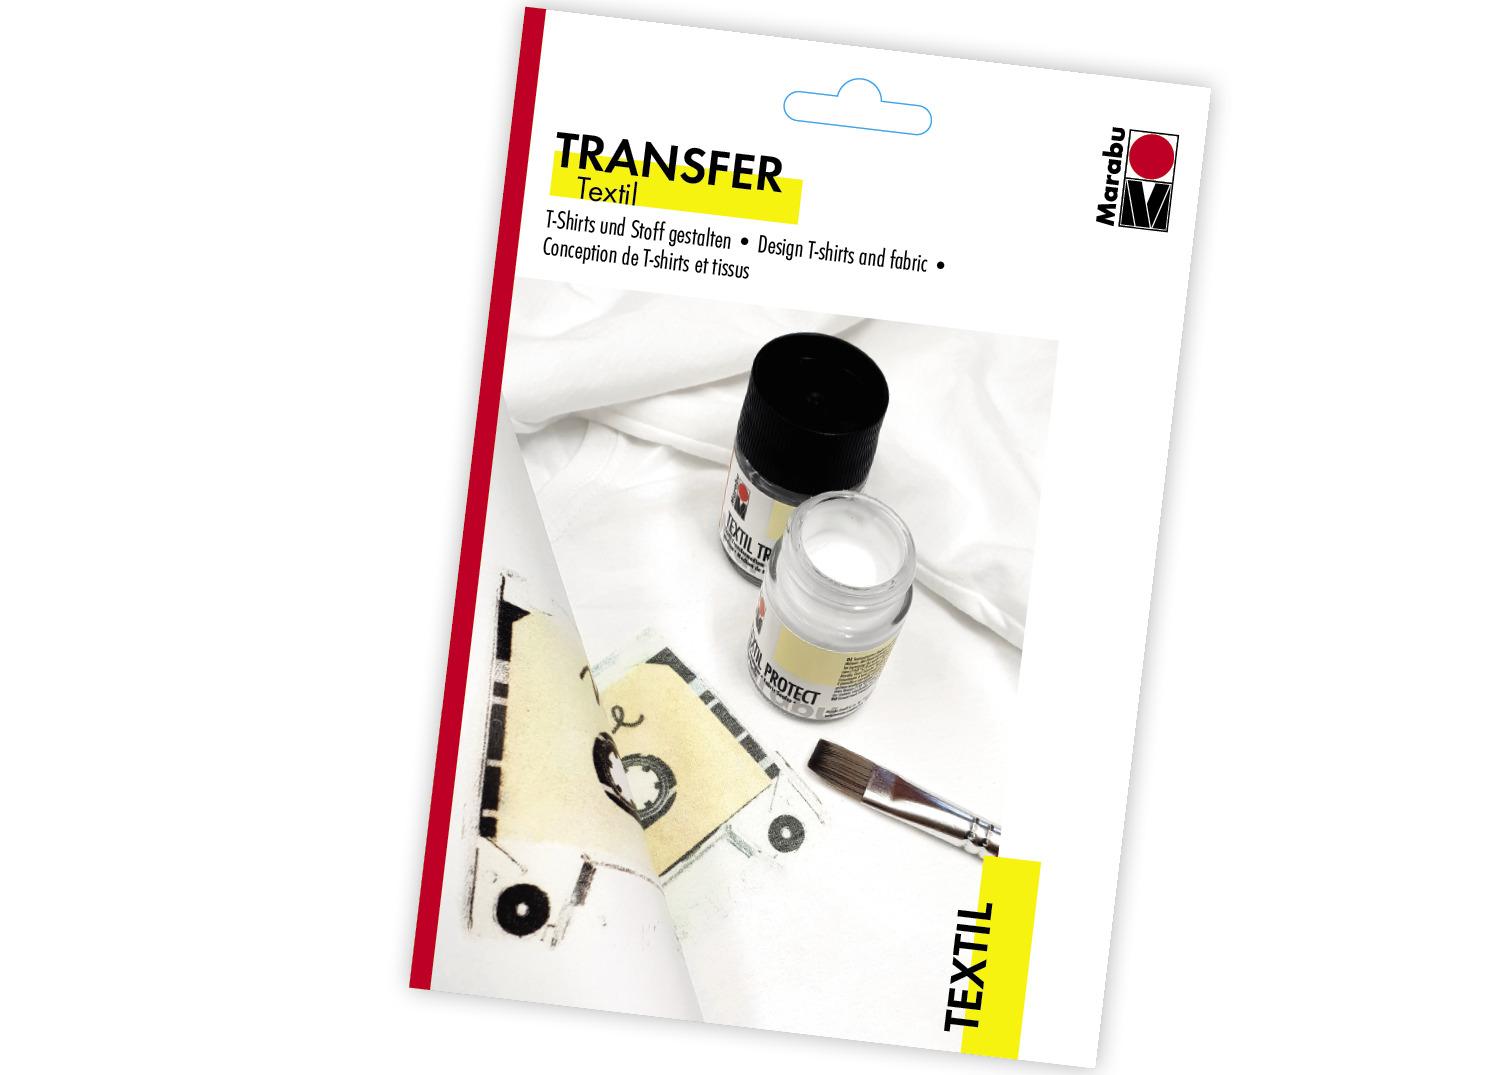 Marabu-Textil-Print-Colouring-Transfer-Title.jpg